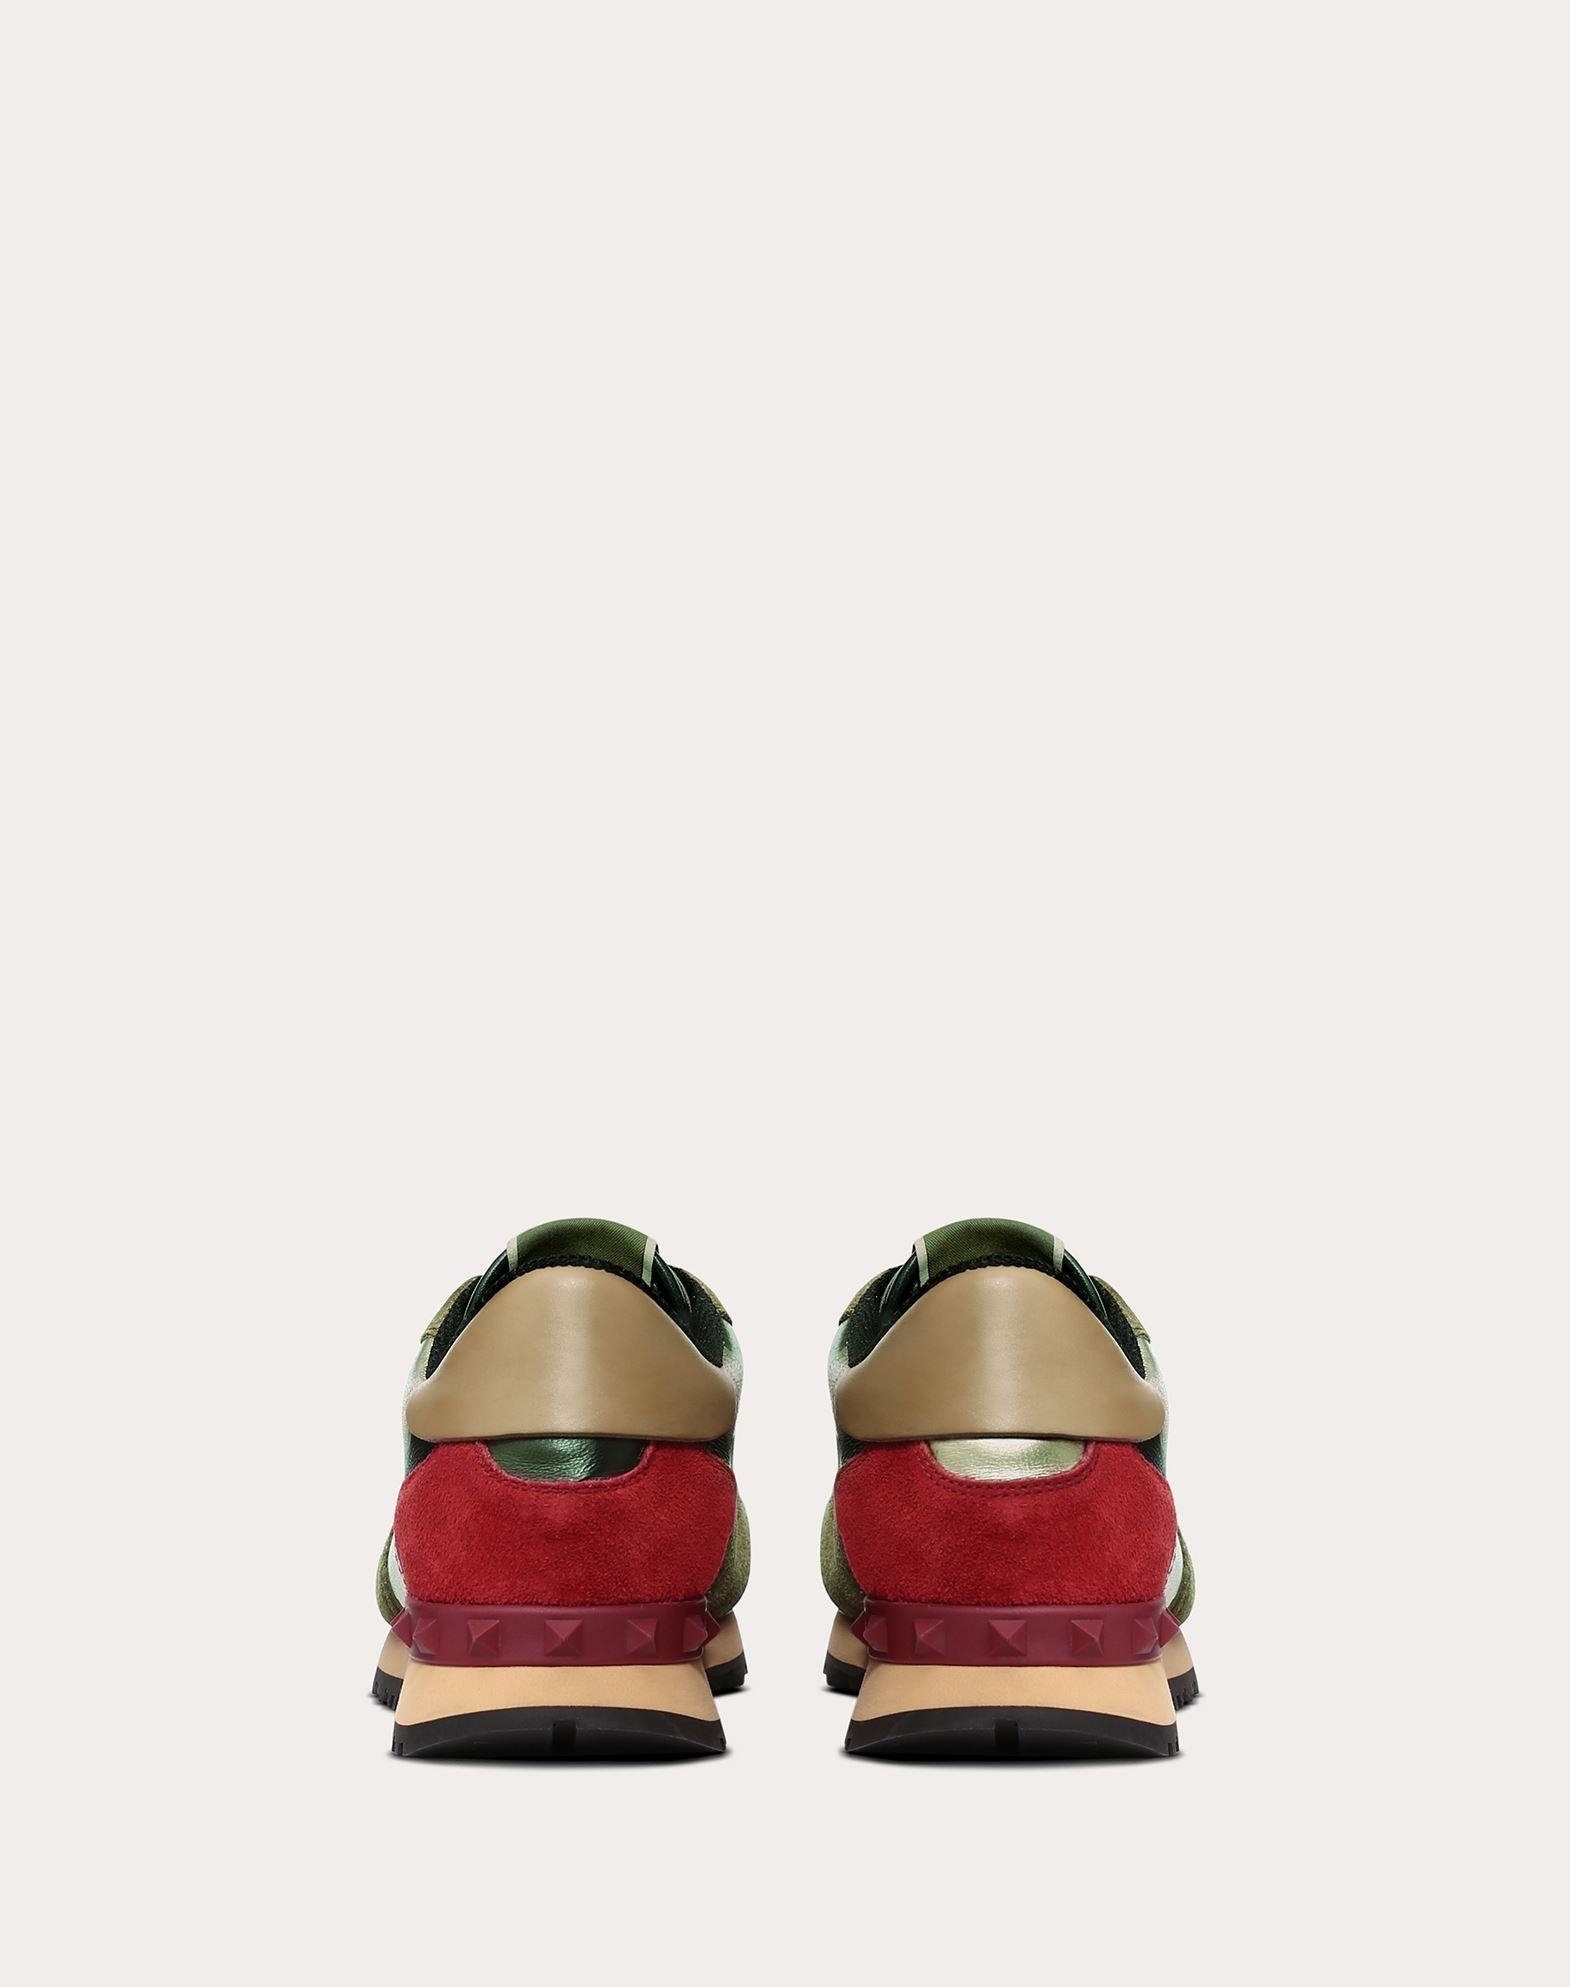 VALENTINO GARAVANI Camouflage sneaker LOW-TOP SNEAKERS D d